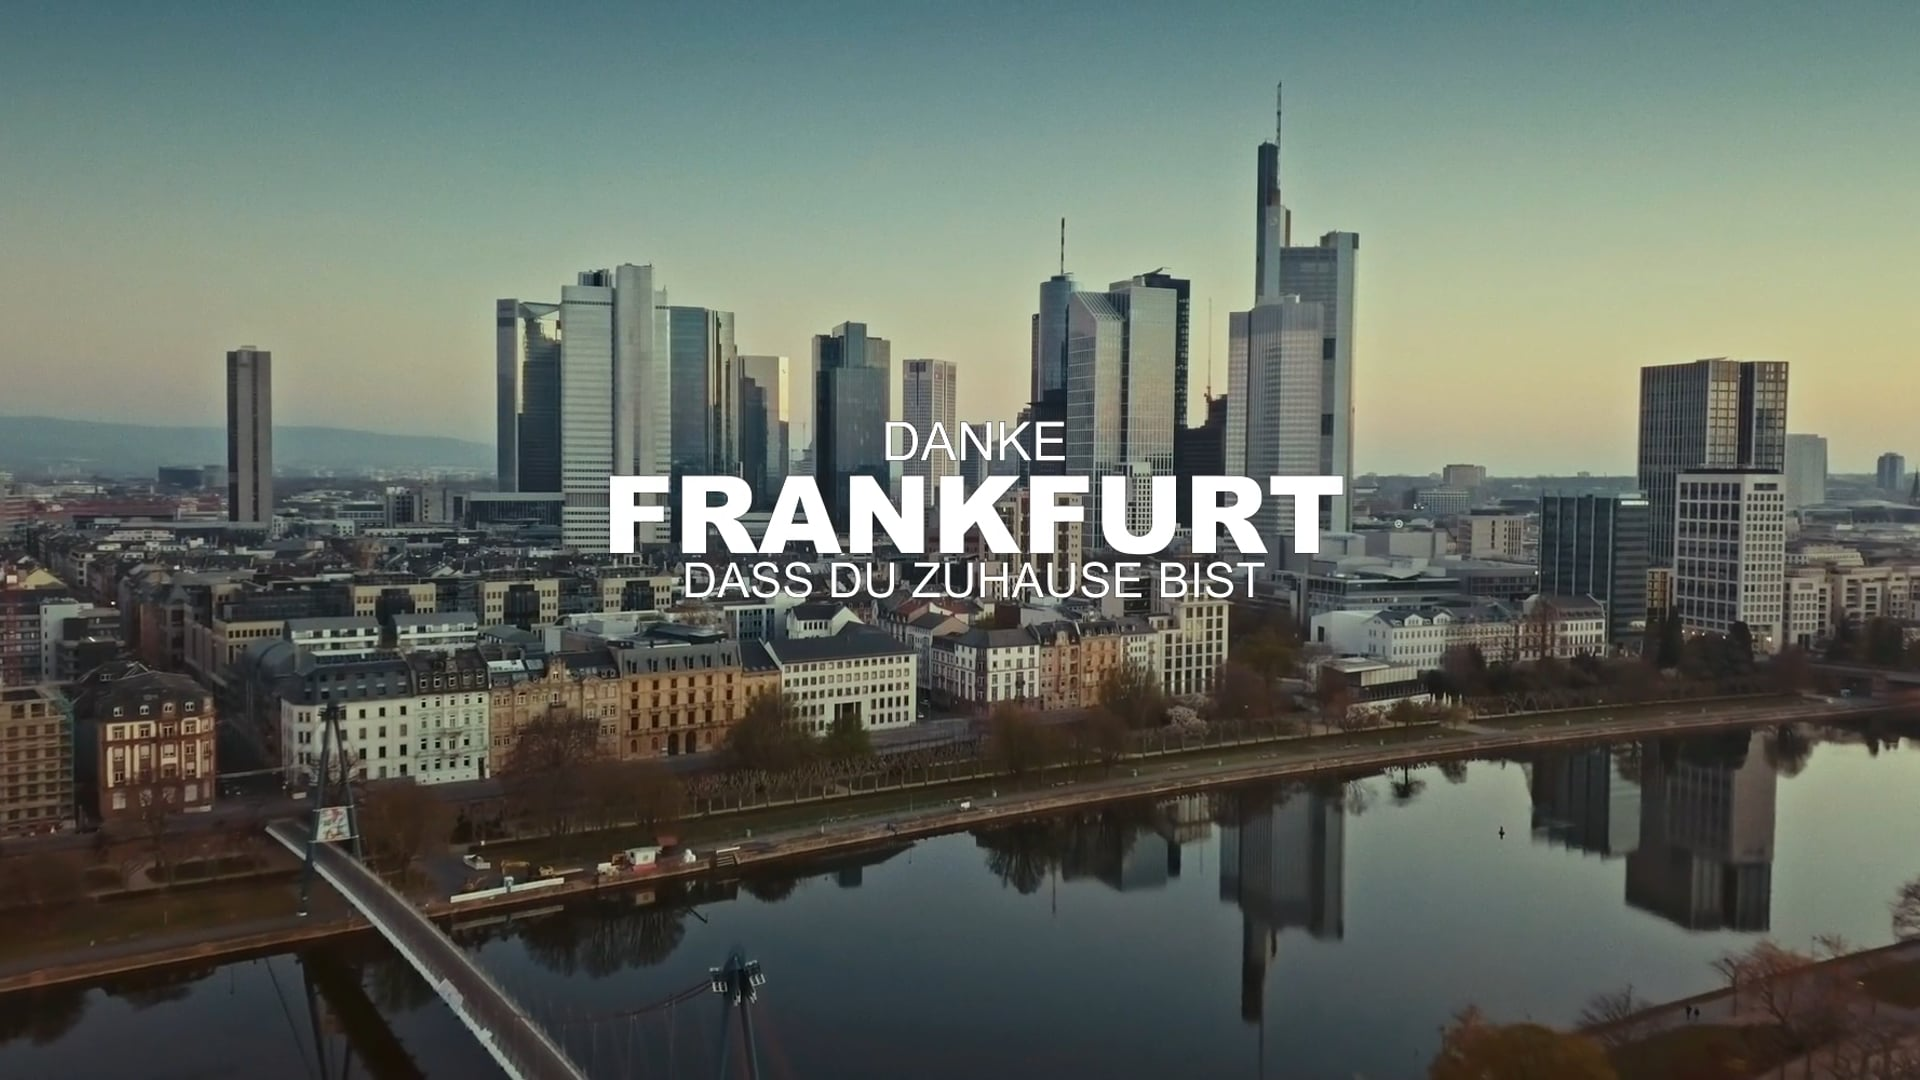 DANKE FRANKFURT